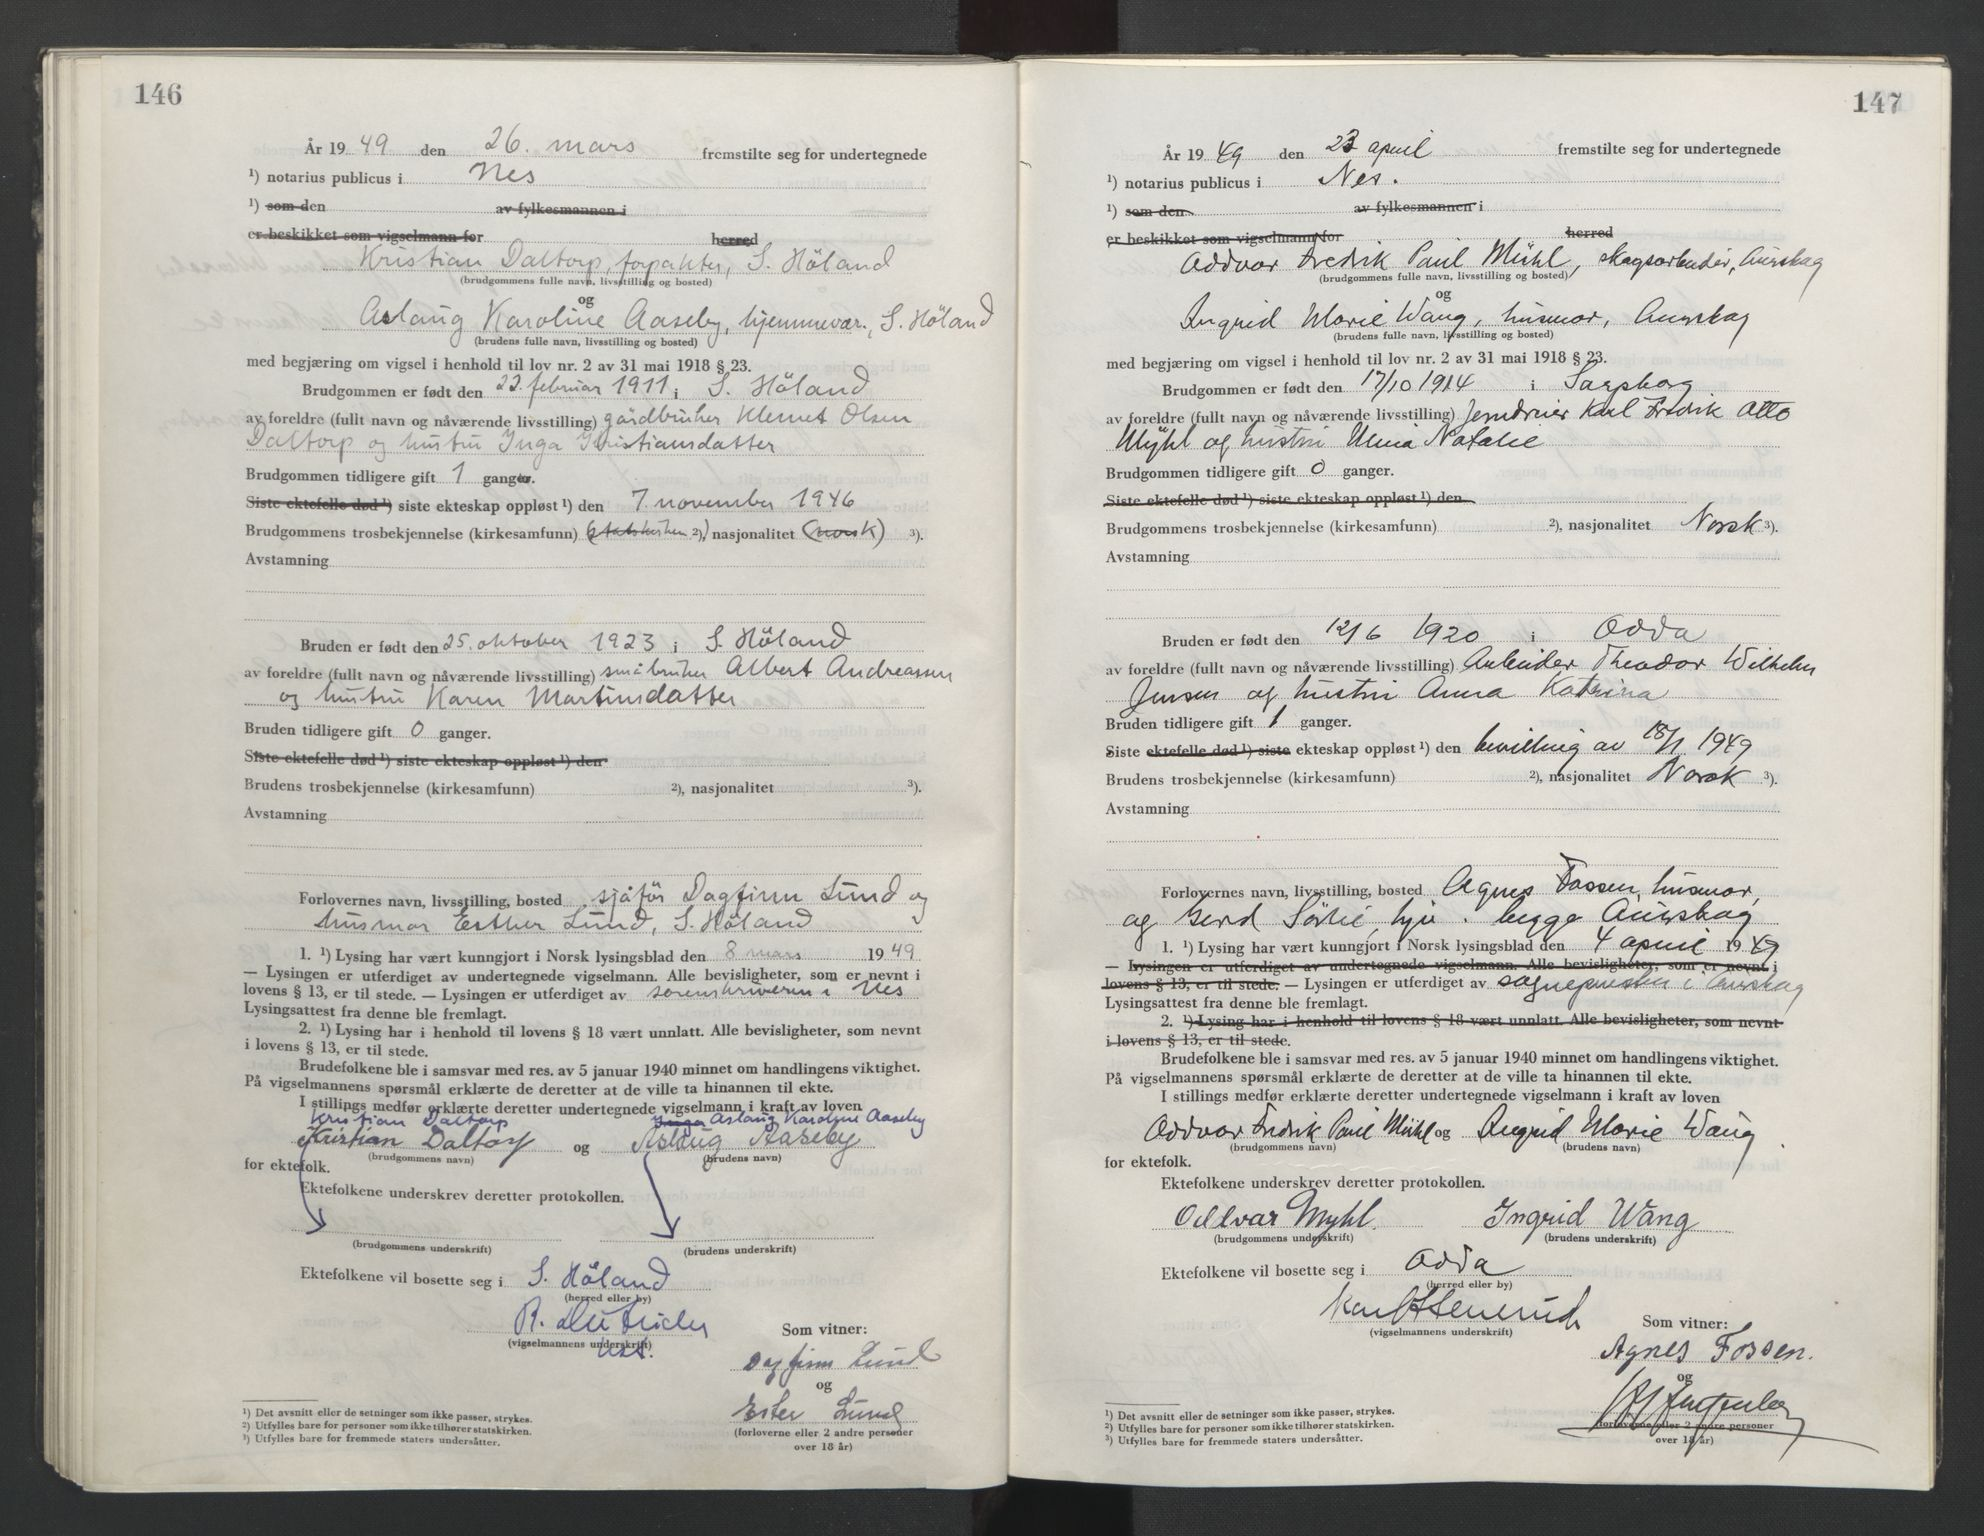 SAO, Nes tingrett, L/Lc/Lca/L0003: Vigselbok, 1944-1953, s. 146-147